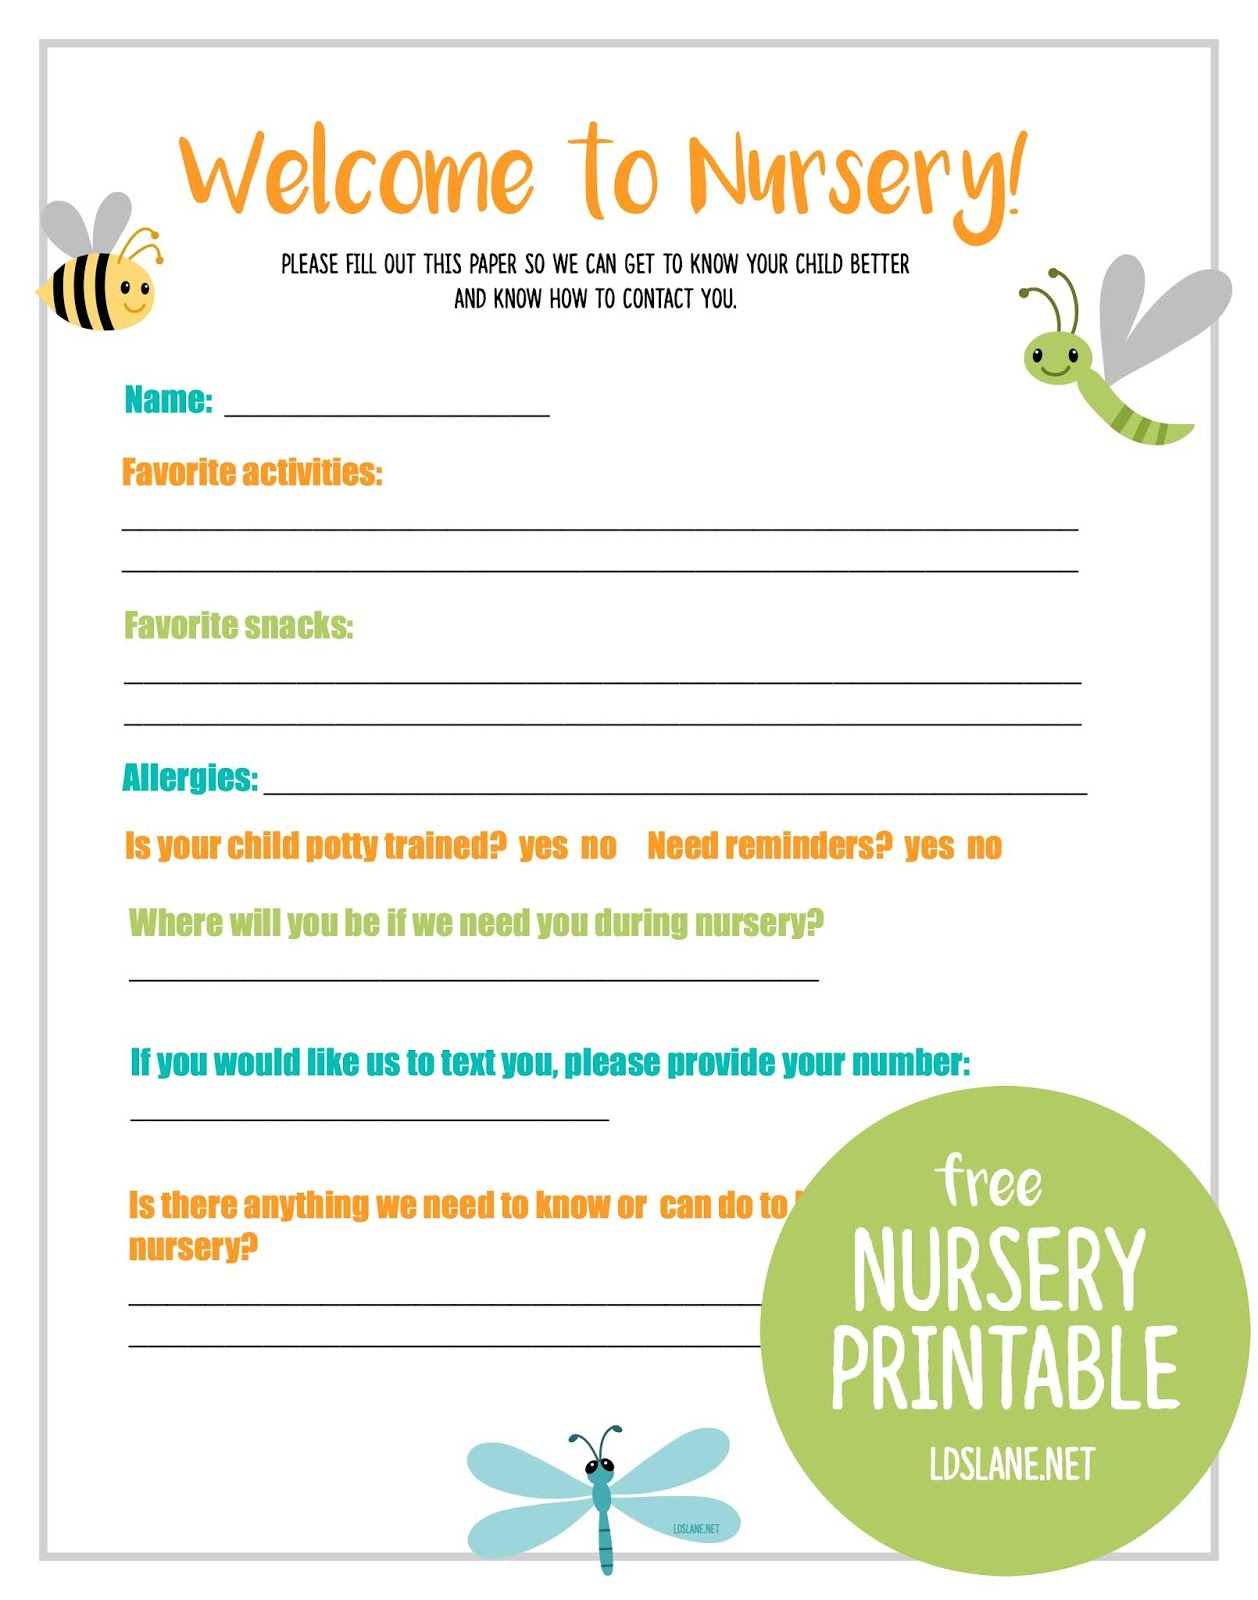 Free Lds Nursery Printable